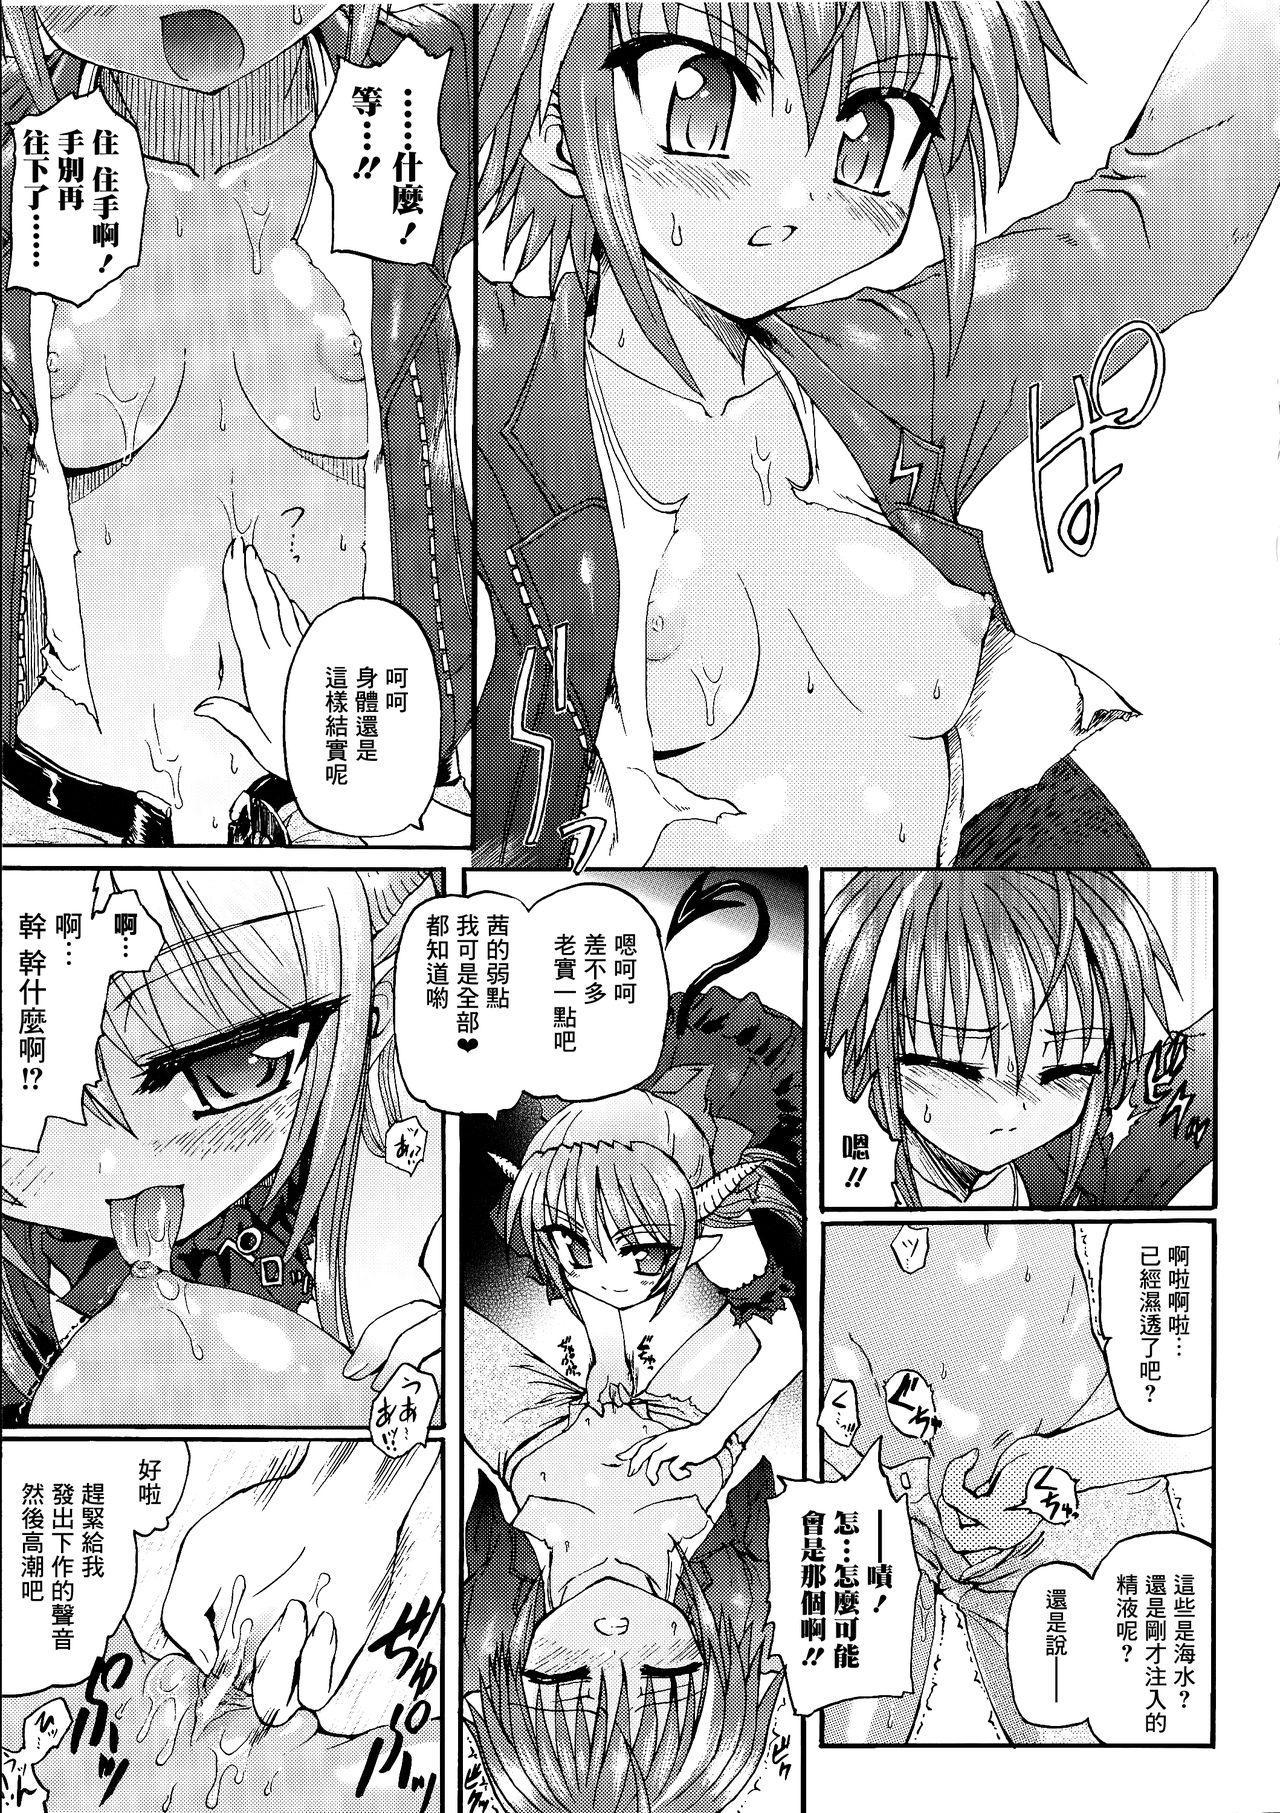 Ma ga Ochiru Yoru Demonic Imitator CH.1-7 71